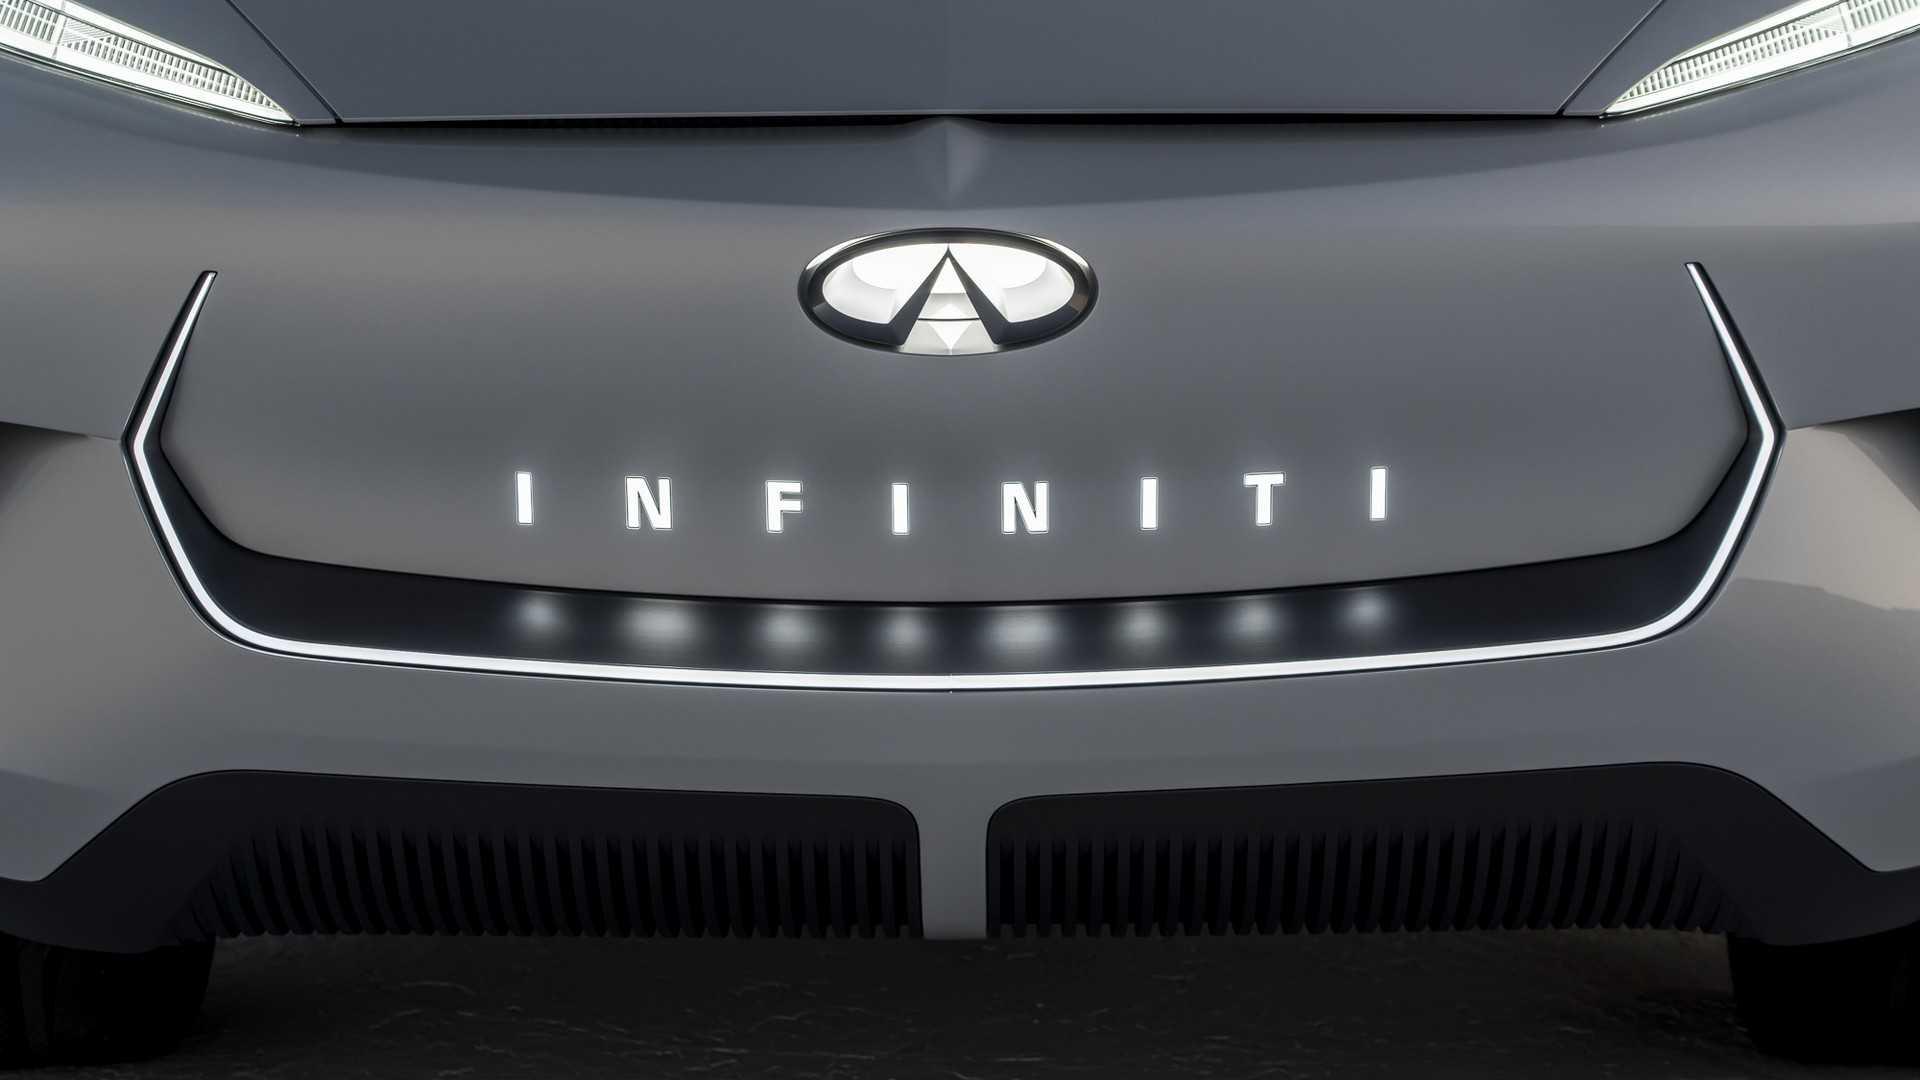 42 All New Infiniti Europe 2020 Pricing for Infiniti Europe 2020